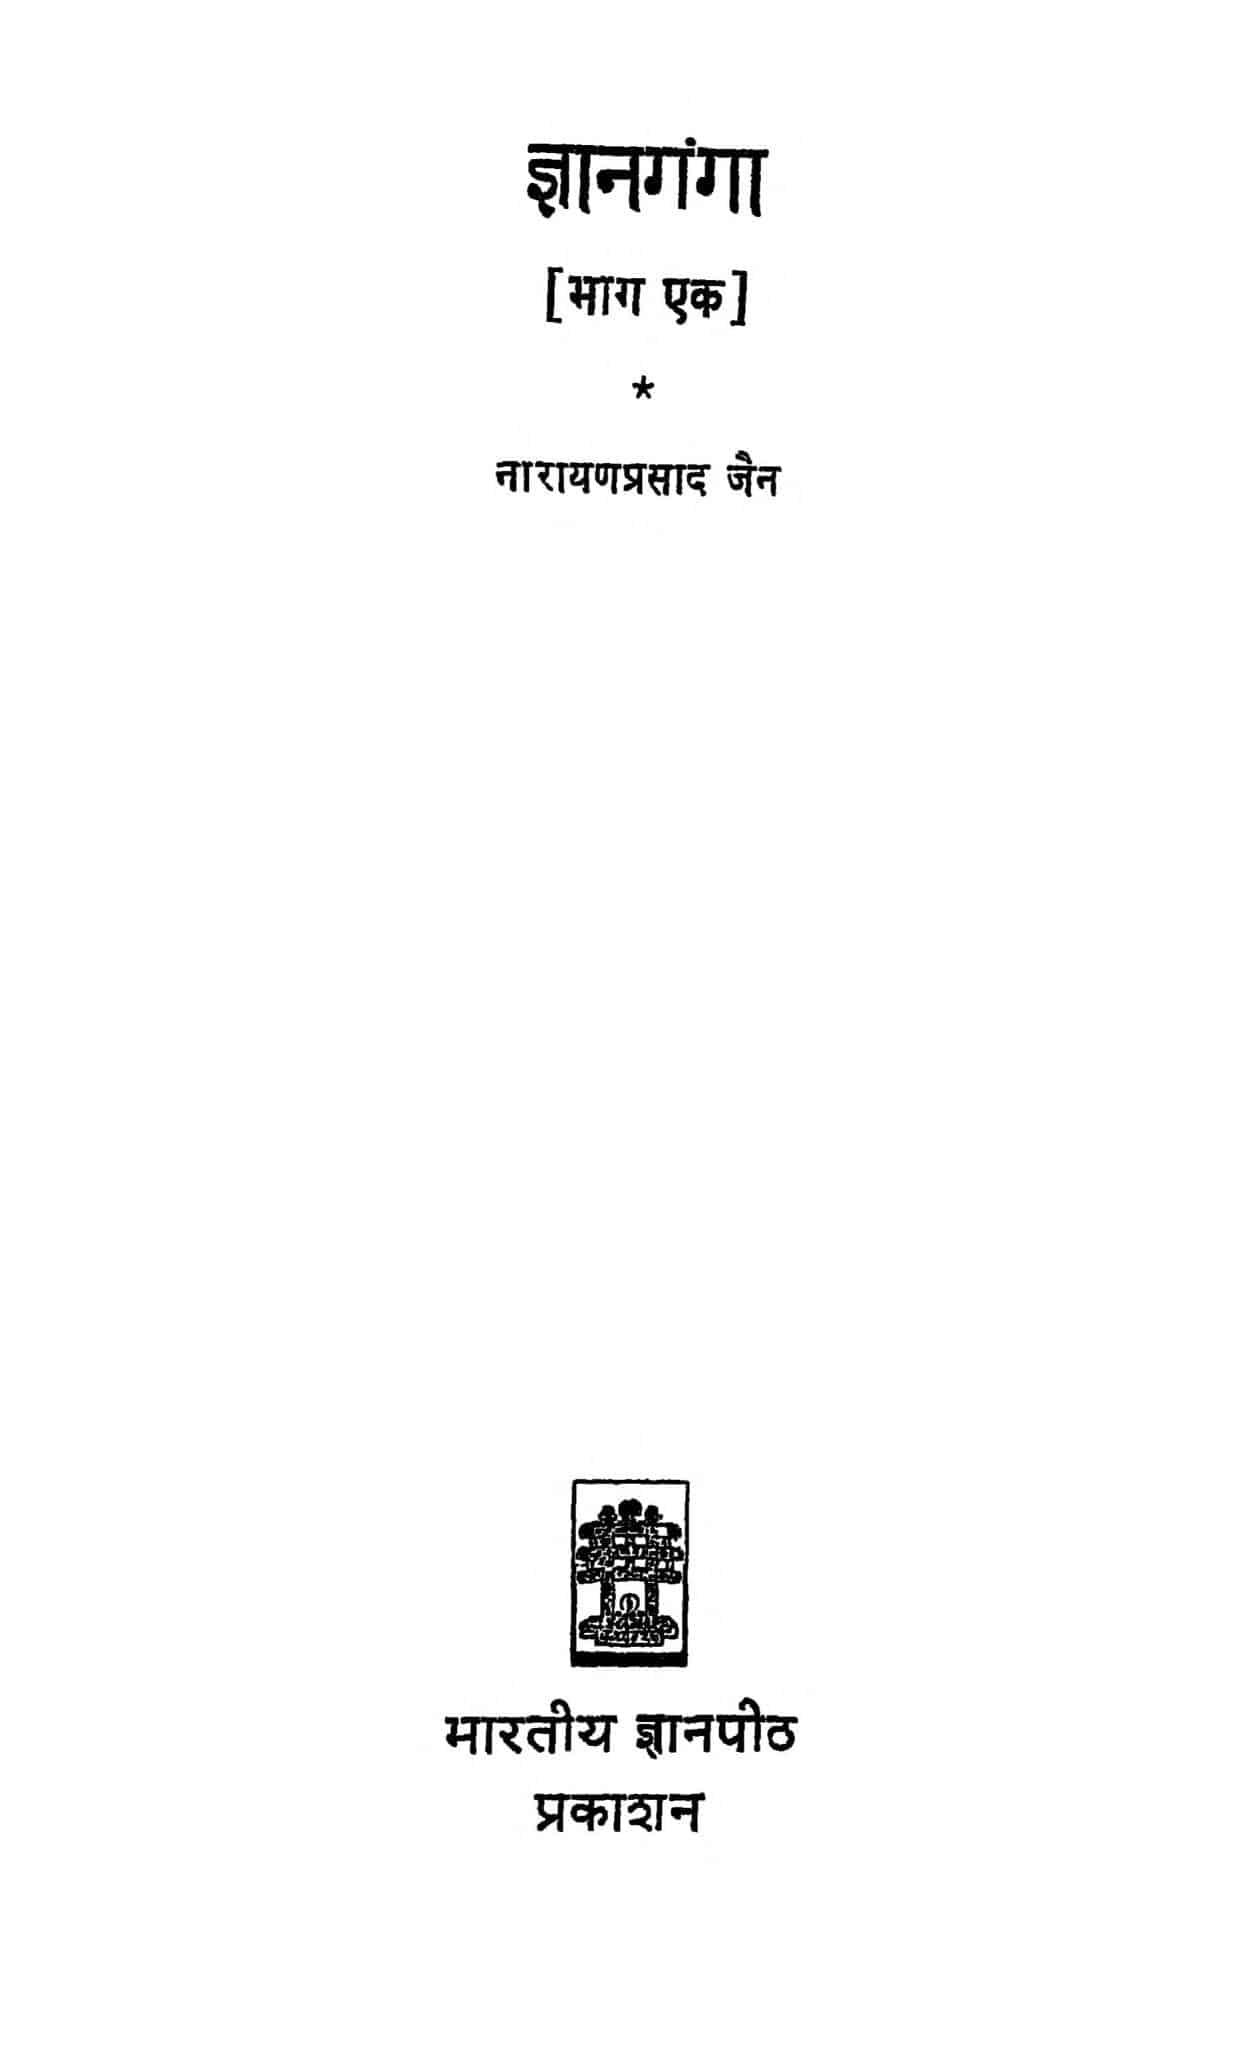 Gyan Ganga by नारायण प्रसाद जैन - Narayan Prasad Jain